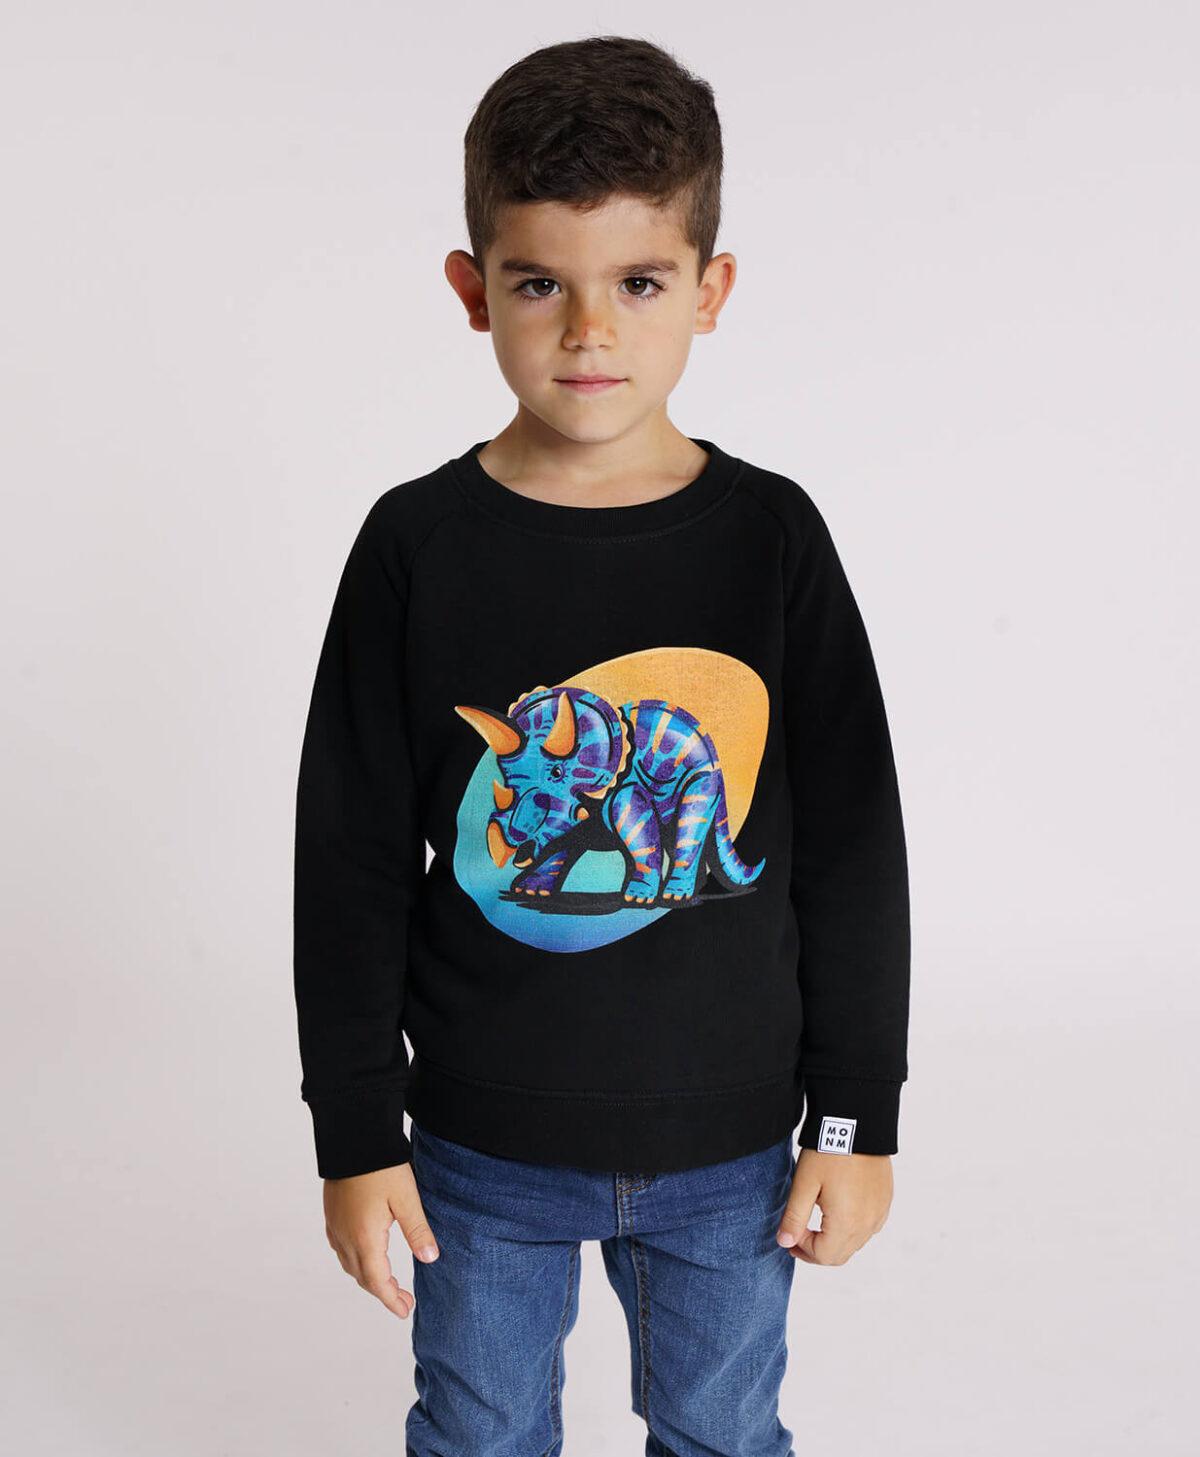 Triceratops sweater - Mangos on Monday